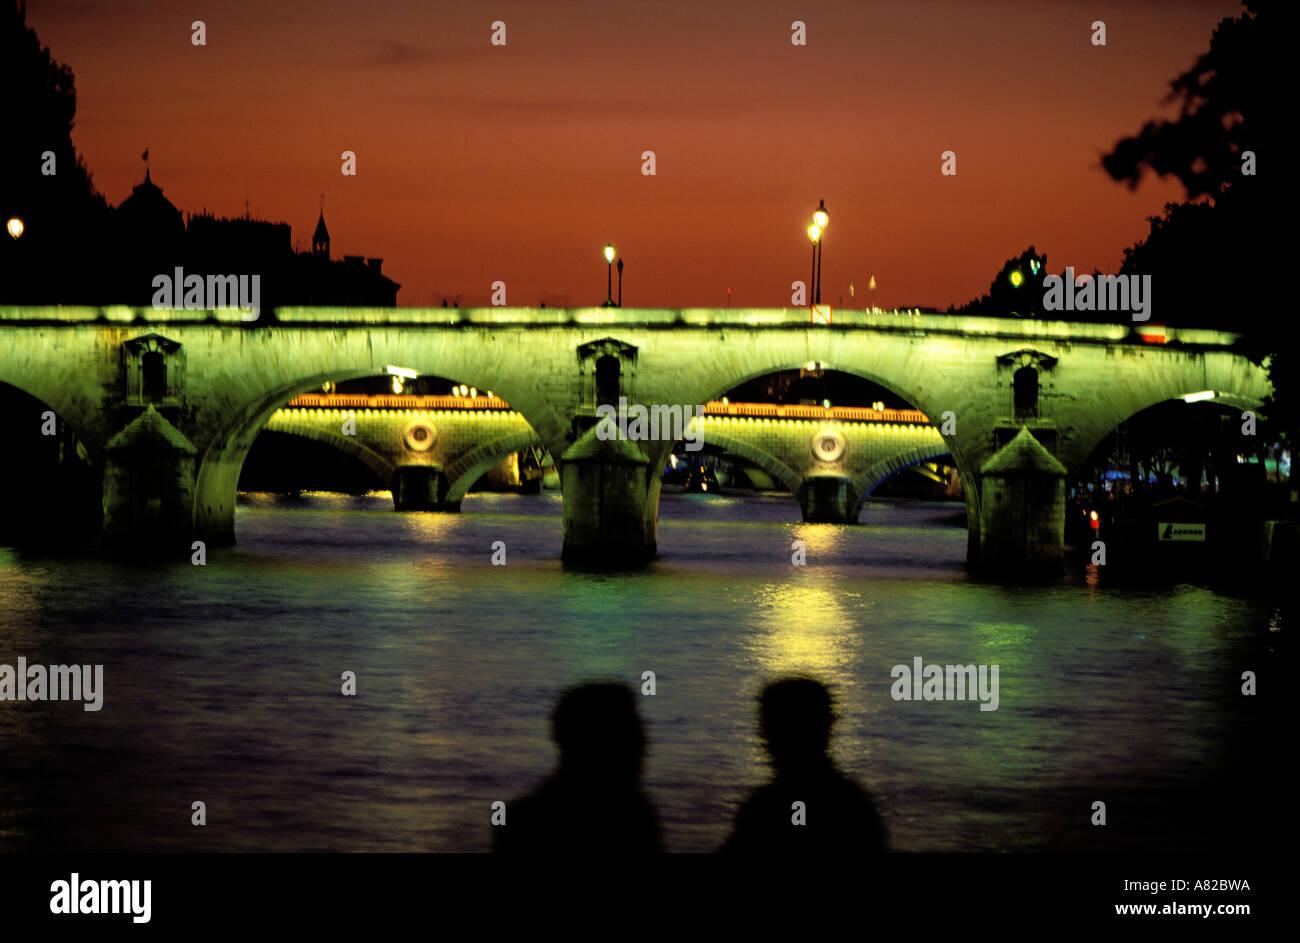 FRANCE PARIS 75 PONT MARIE BRIDGE AT NIGHT - Stock Image